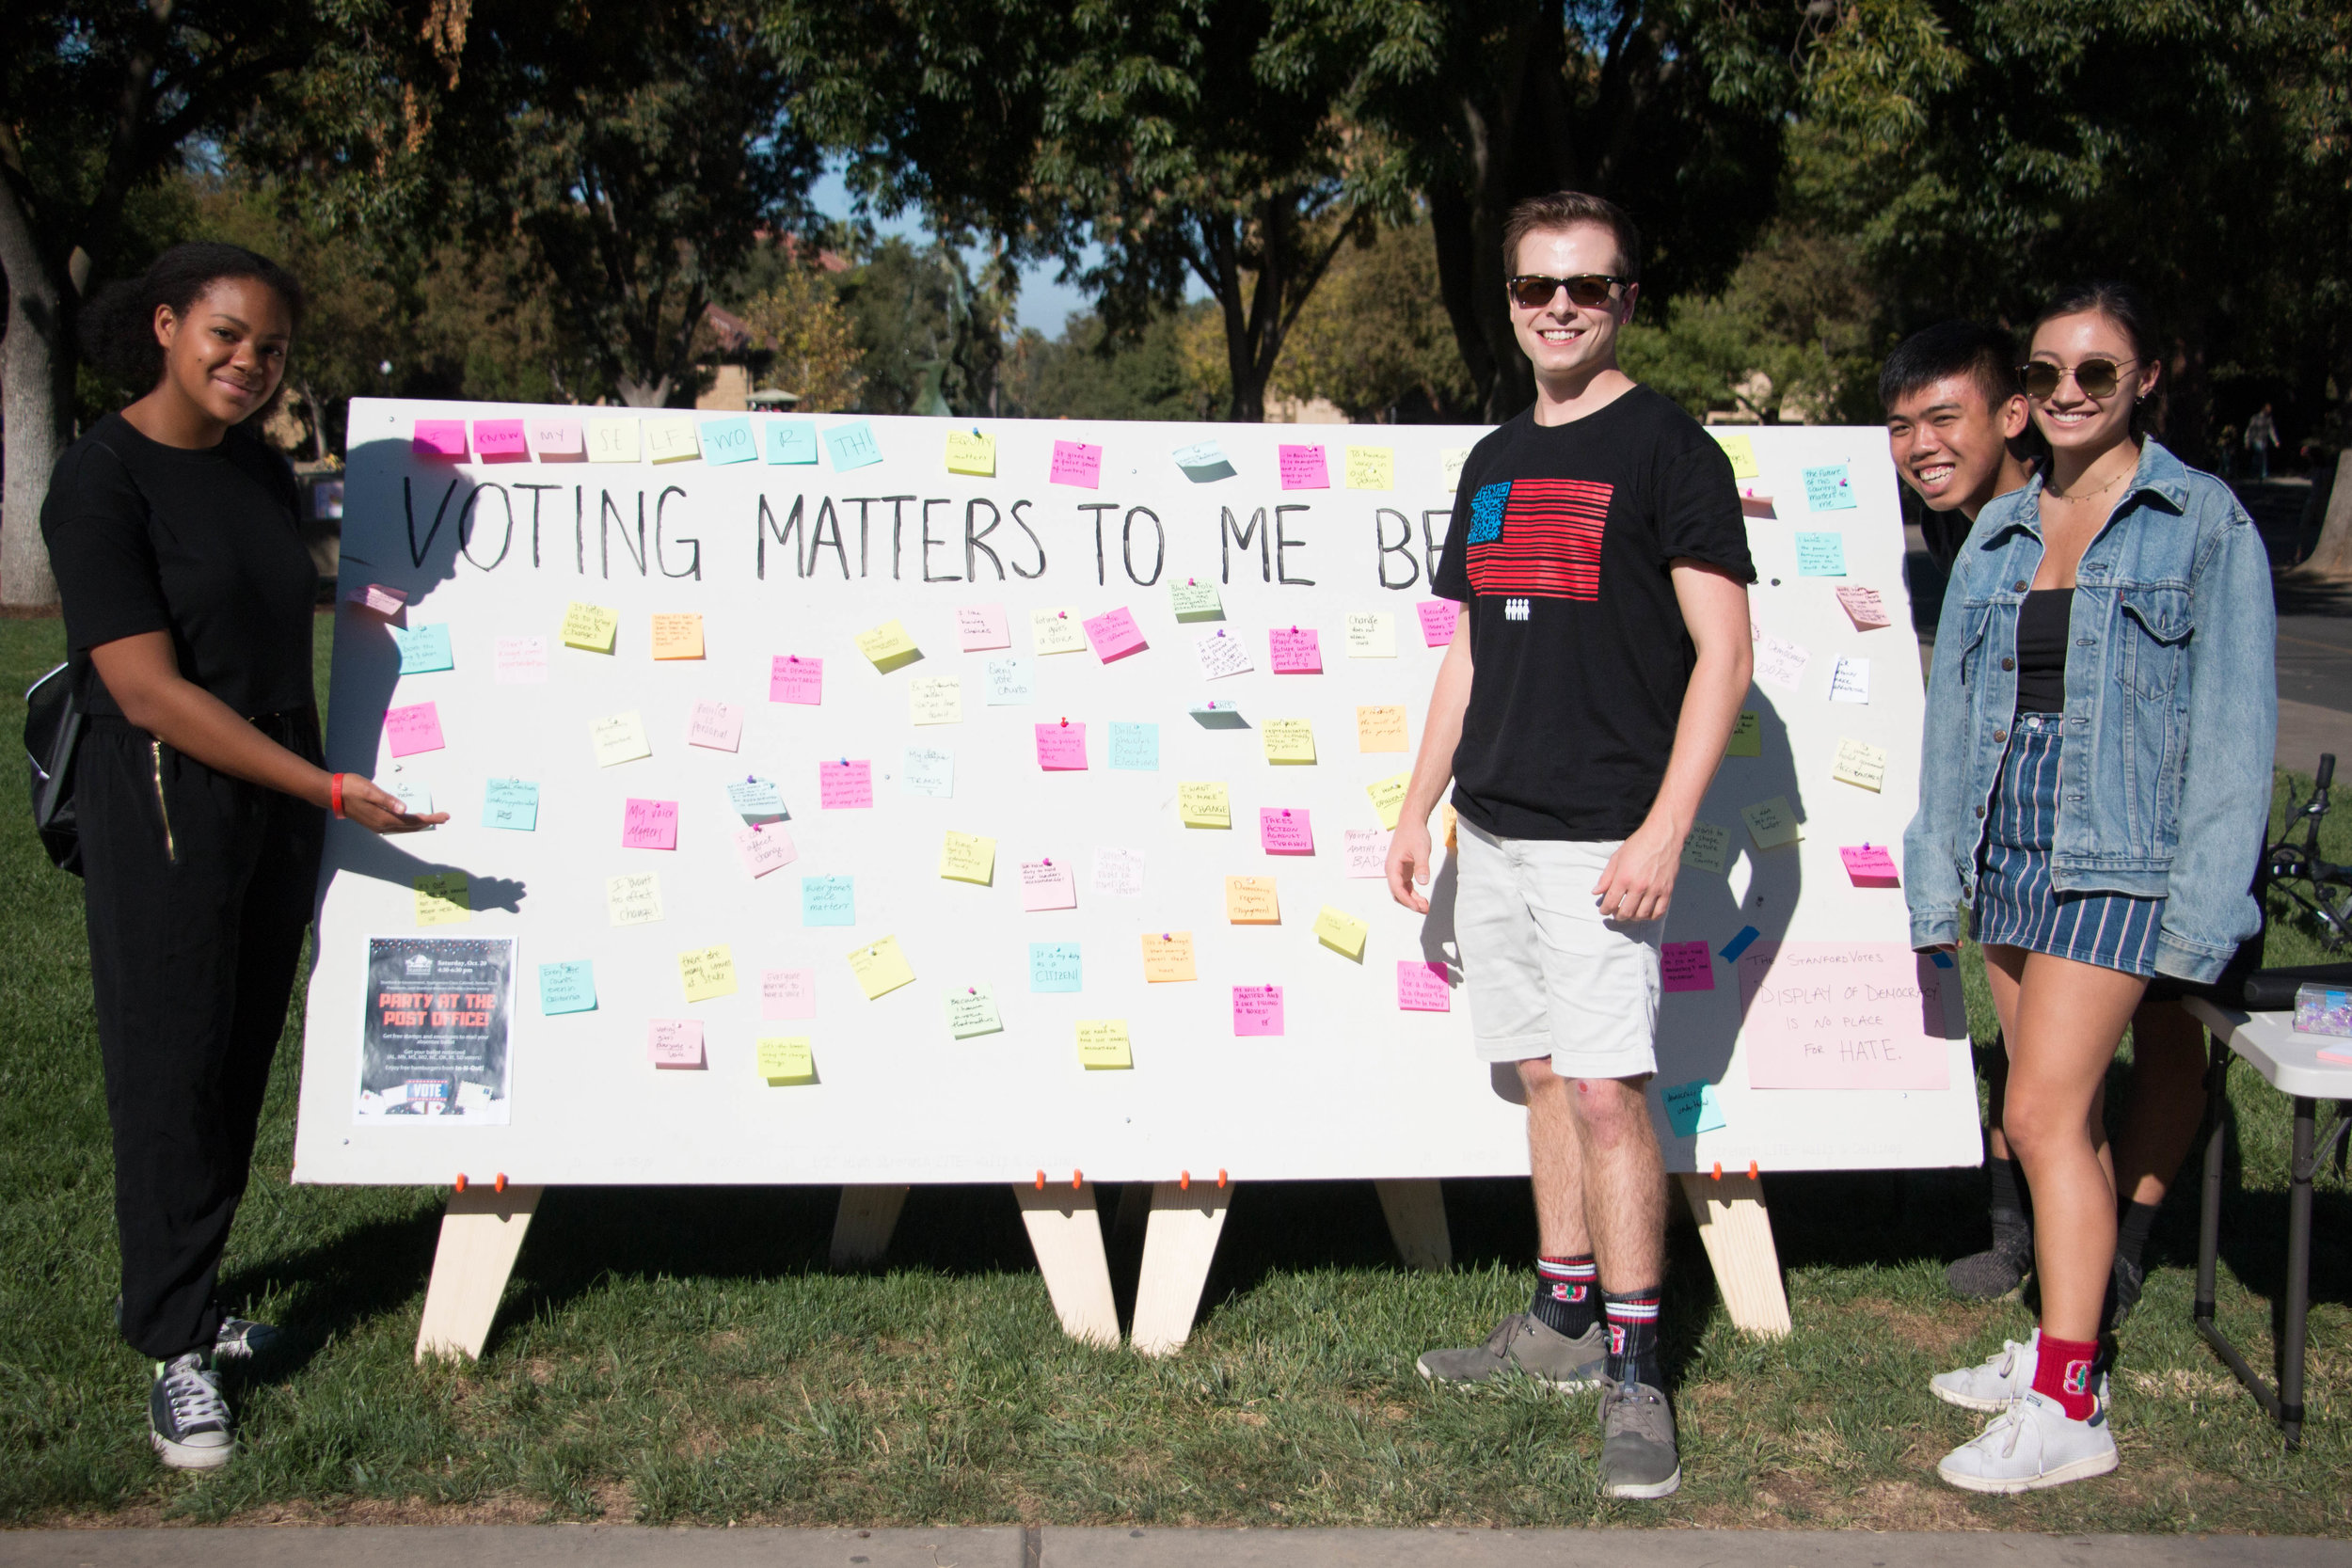 StanfordStudentsWithWhyVotingMattersSign.jpg